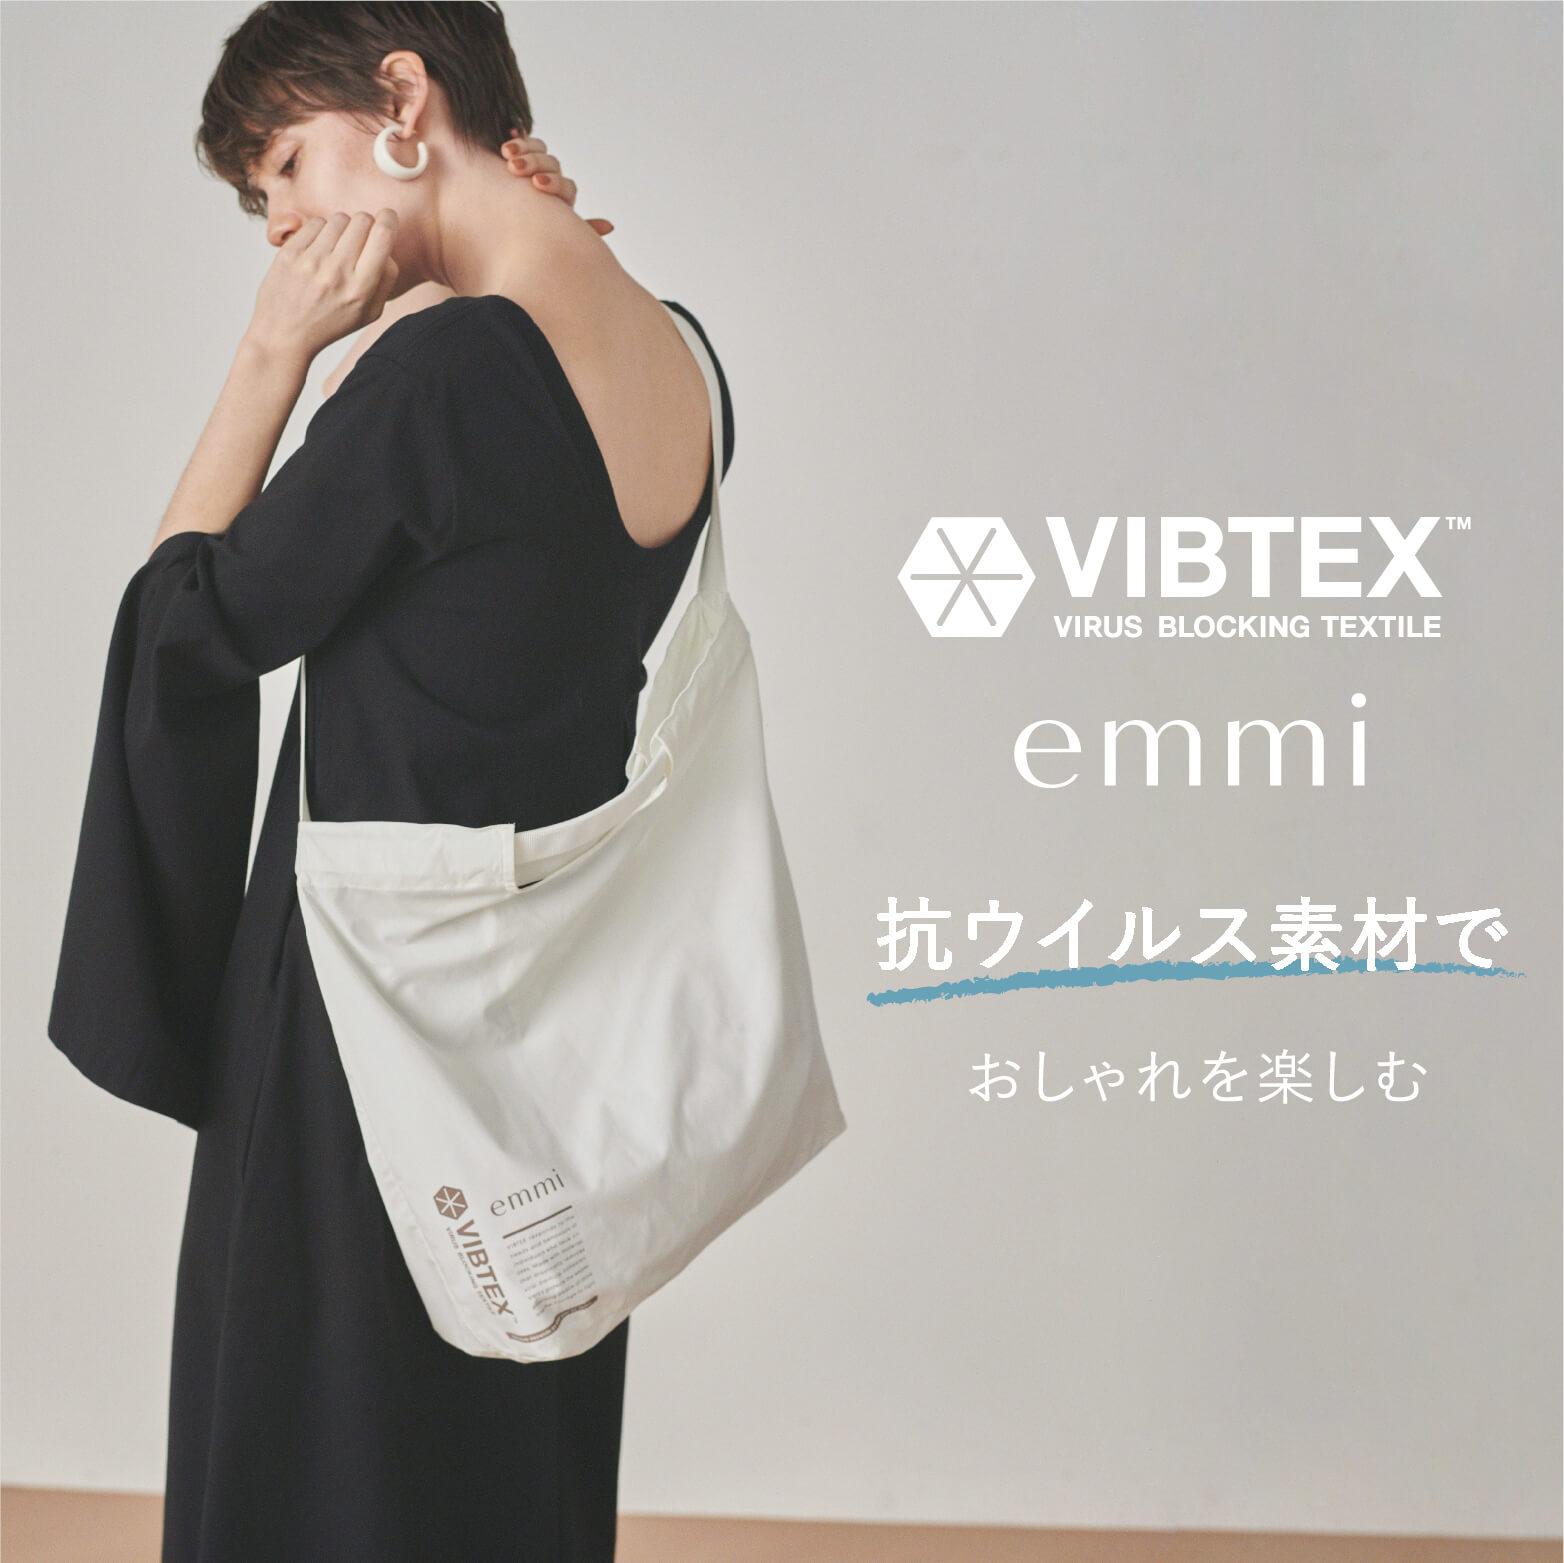 VIBTEX VIRUS BLOCKING TEXTILE